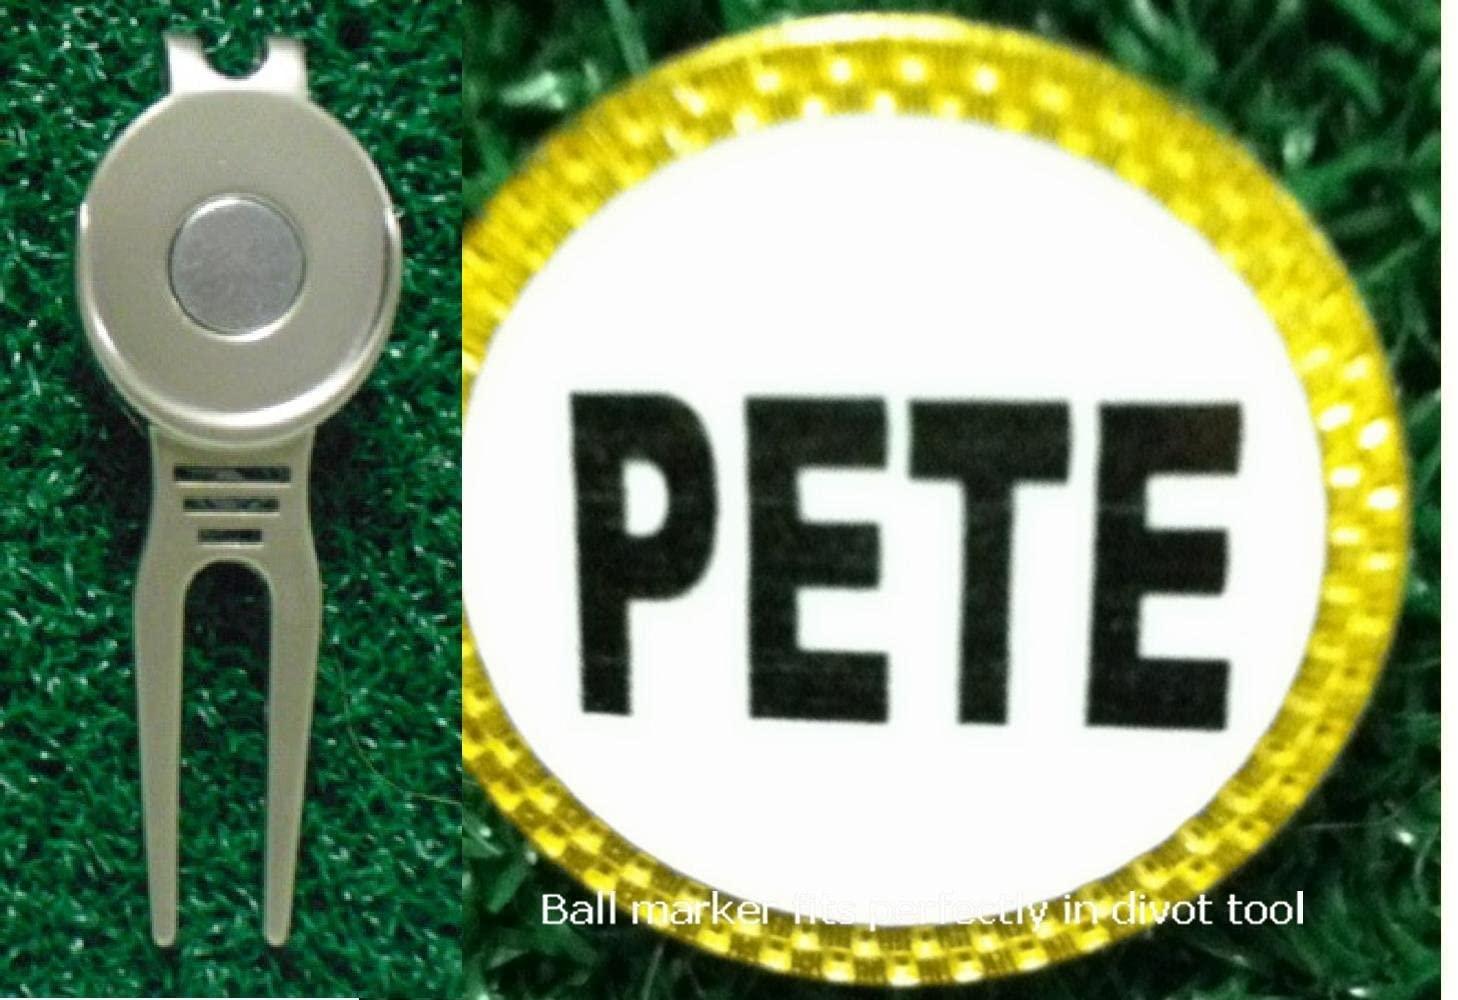 Gatormade Personalized Golf Ball Marker & Divot Tool Pete